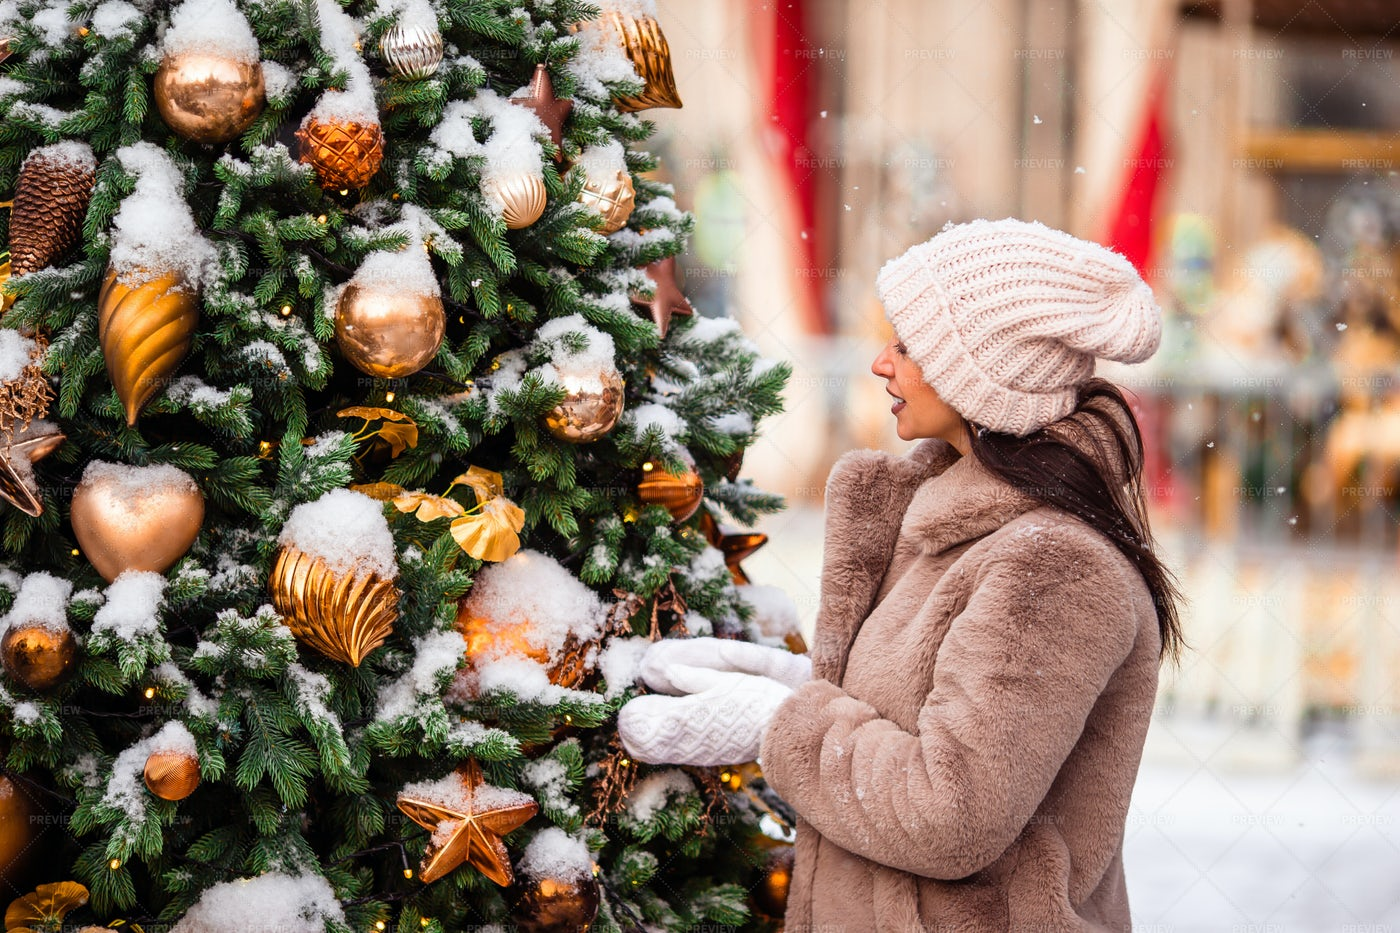 Admiring Christmas Decorations: Stock Photos